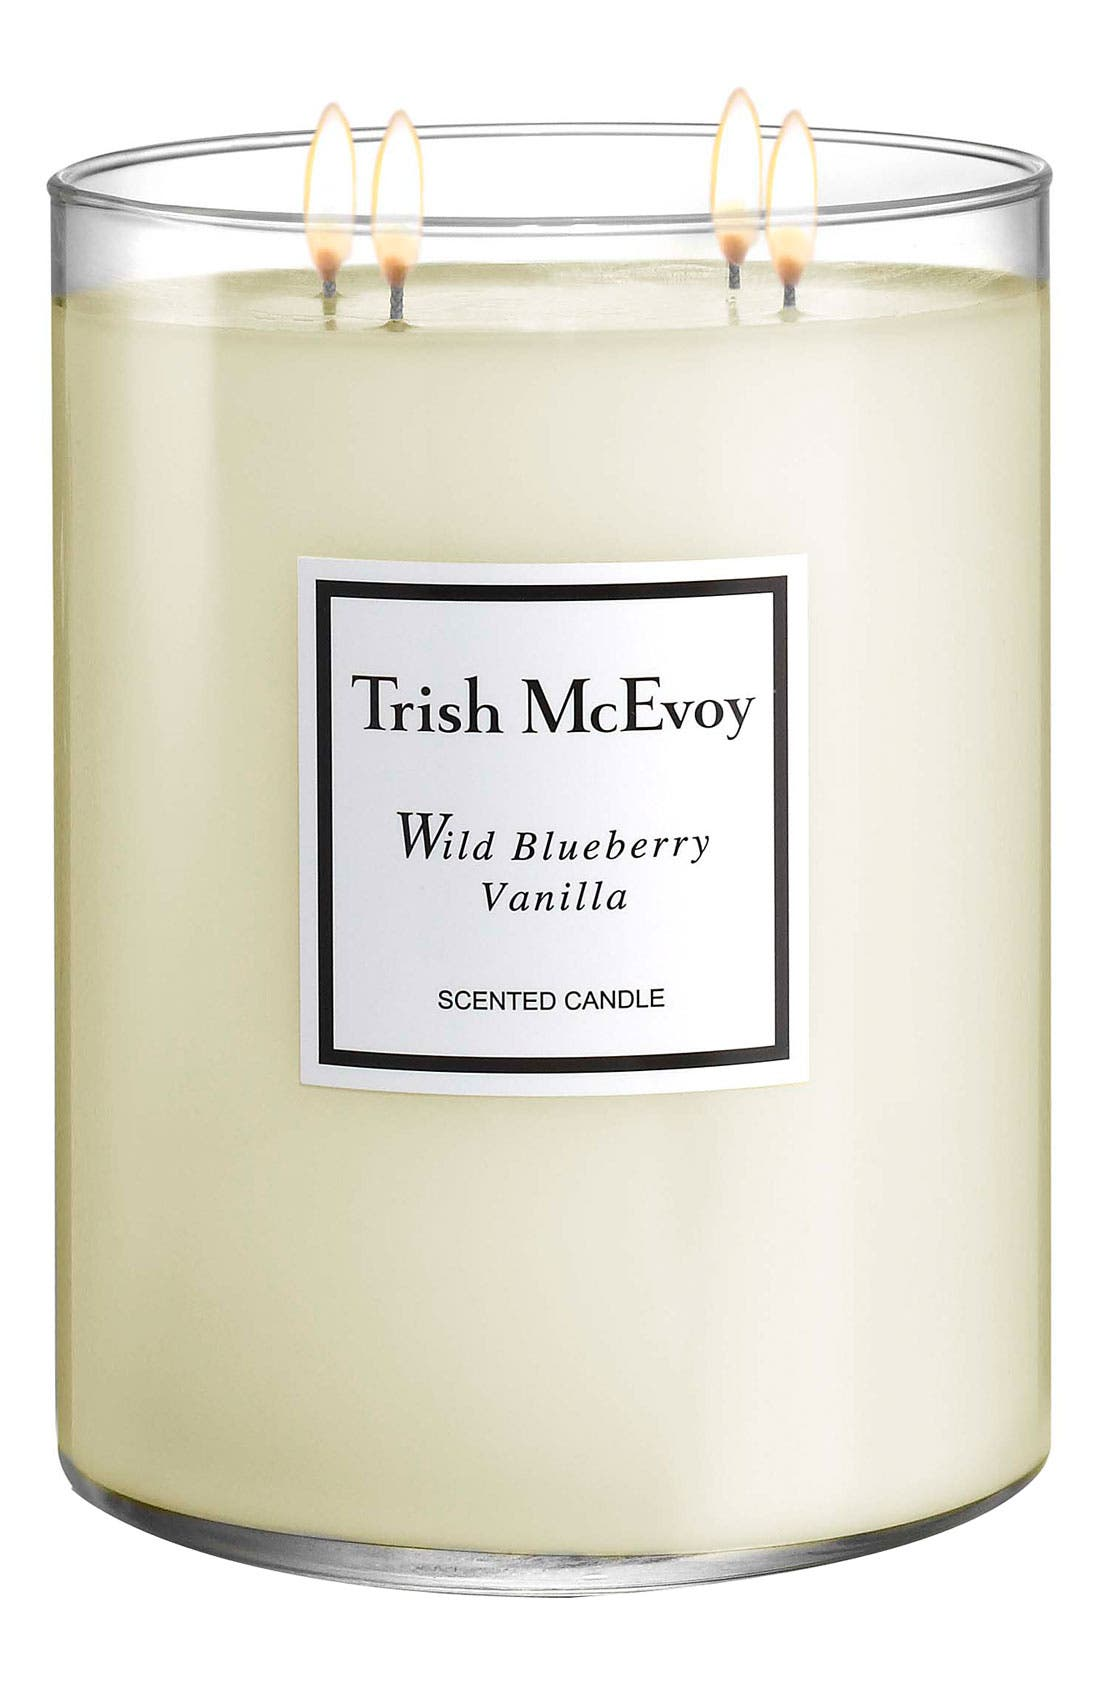 Trish McEvoy 'Wild Blueberry Vanilla' Scented Candle (Luxury Size)